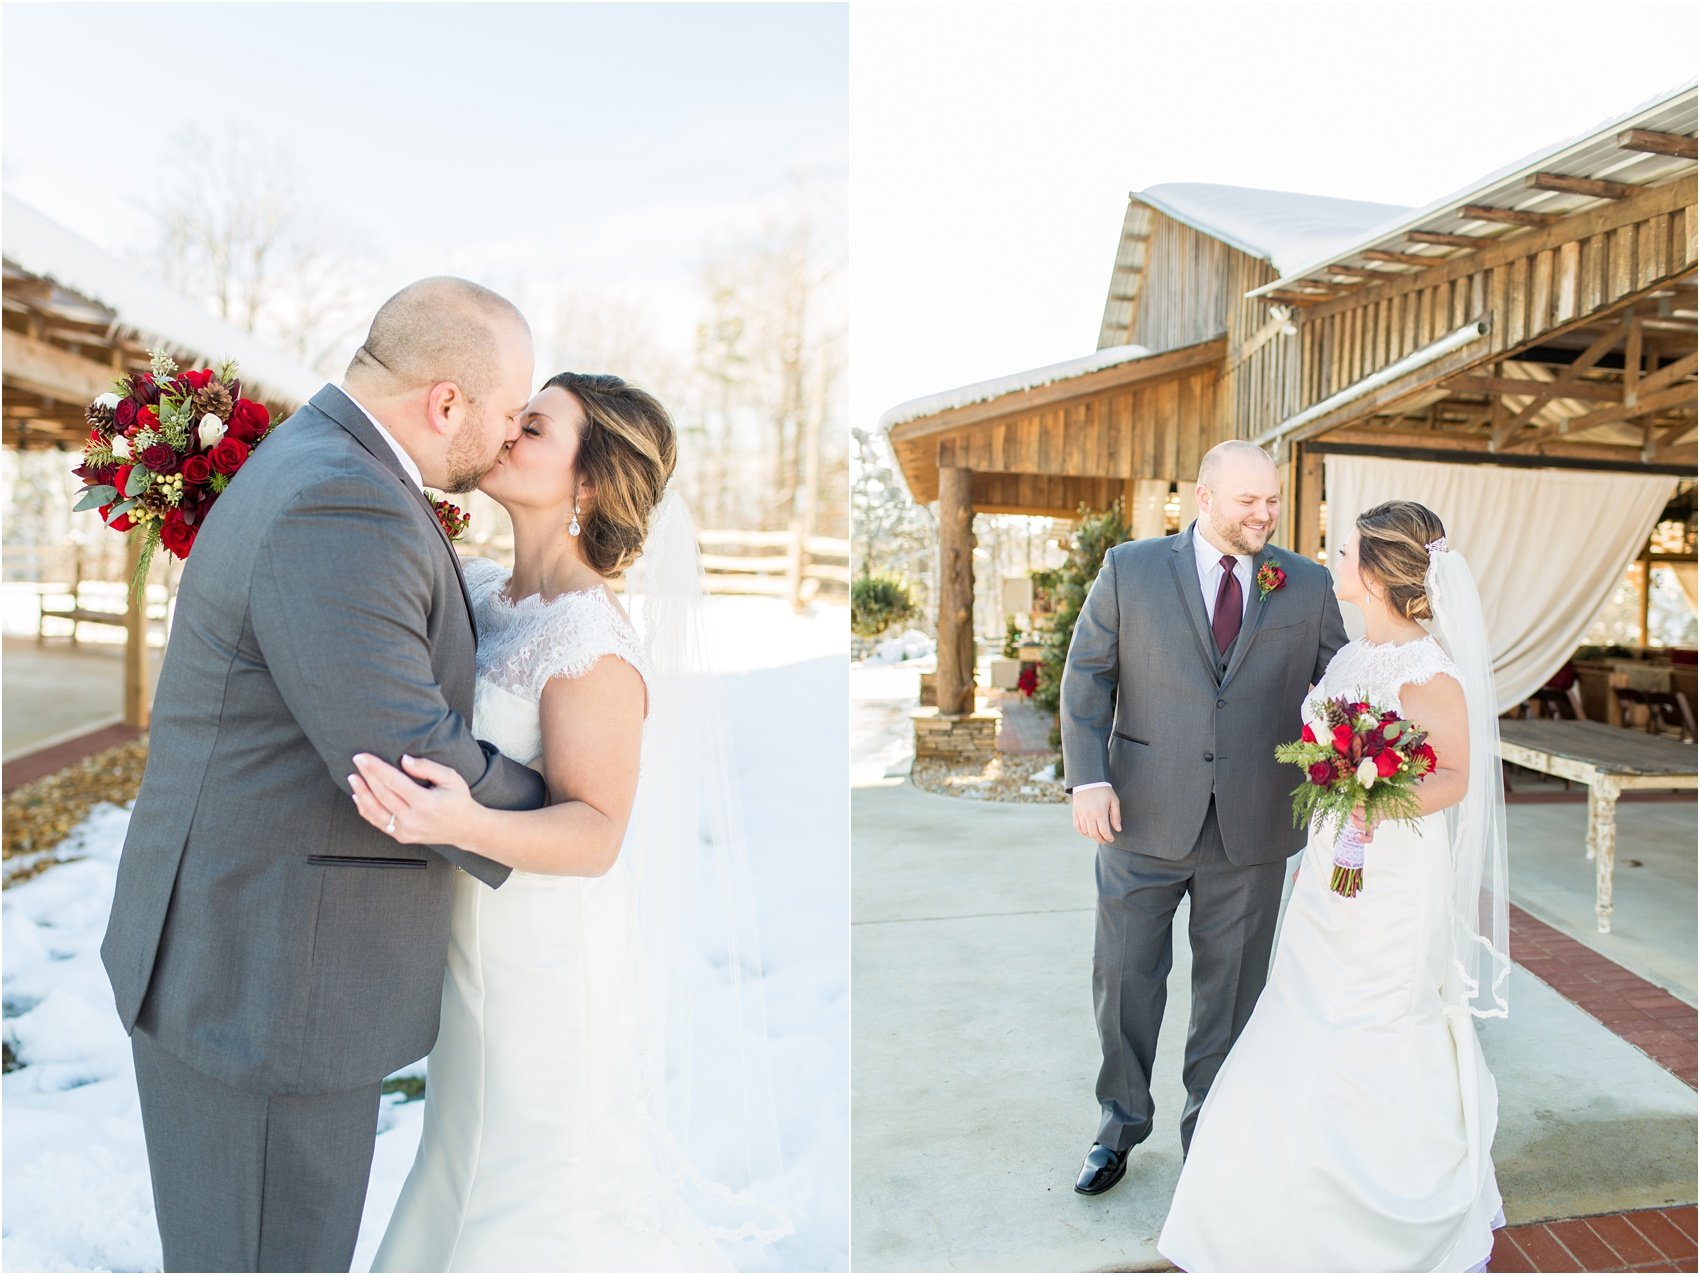 Savannah Eve Photography- Page Wedding Blog-40.jpg